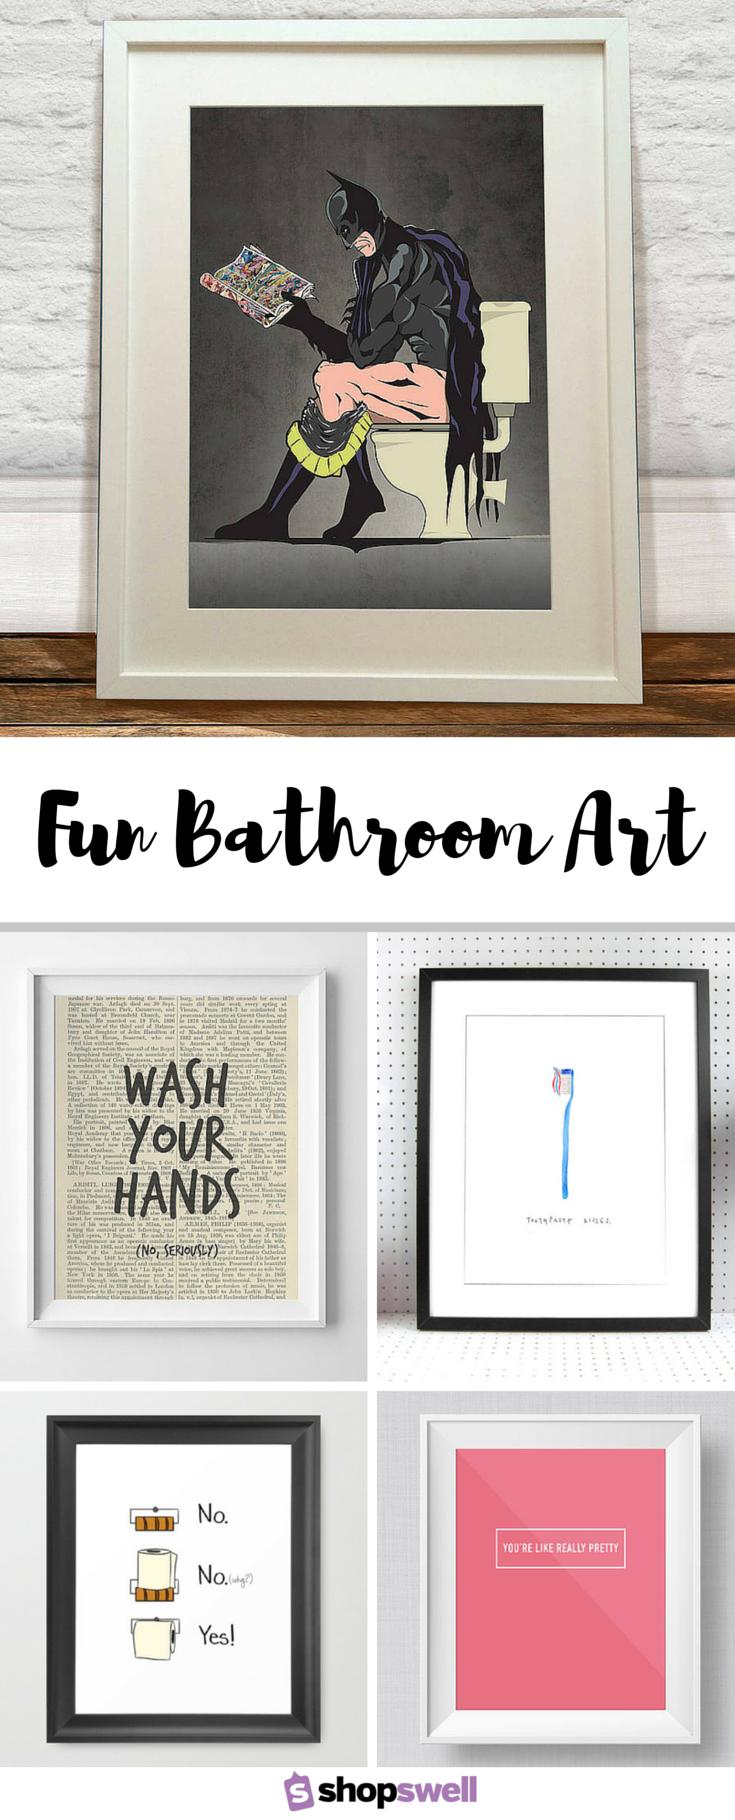 Fun Bathroom Art Shopswell In 2020 Bathroom Art Amazing Bathrooms Quirky Decor